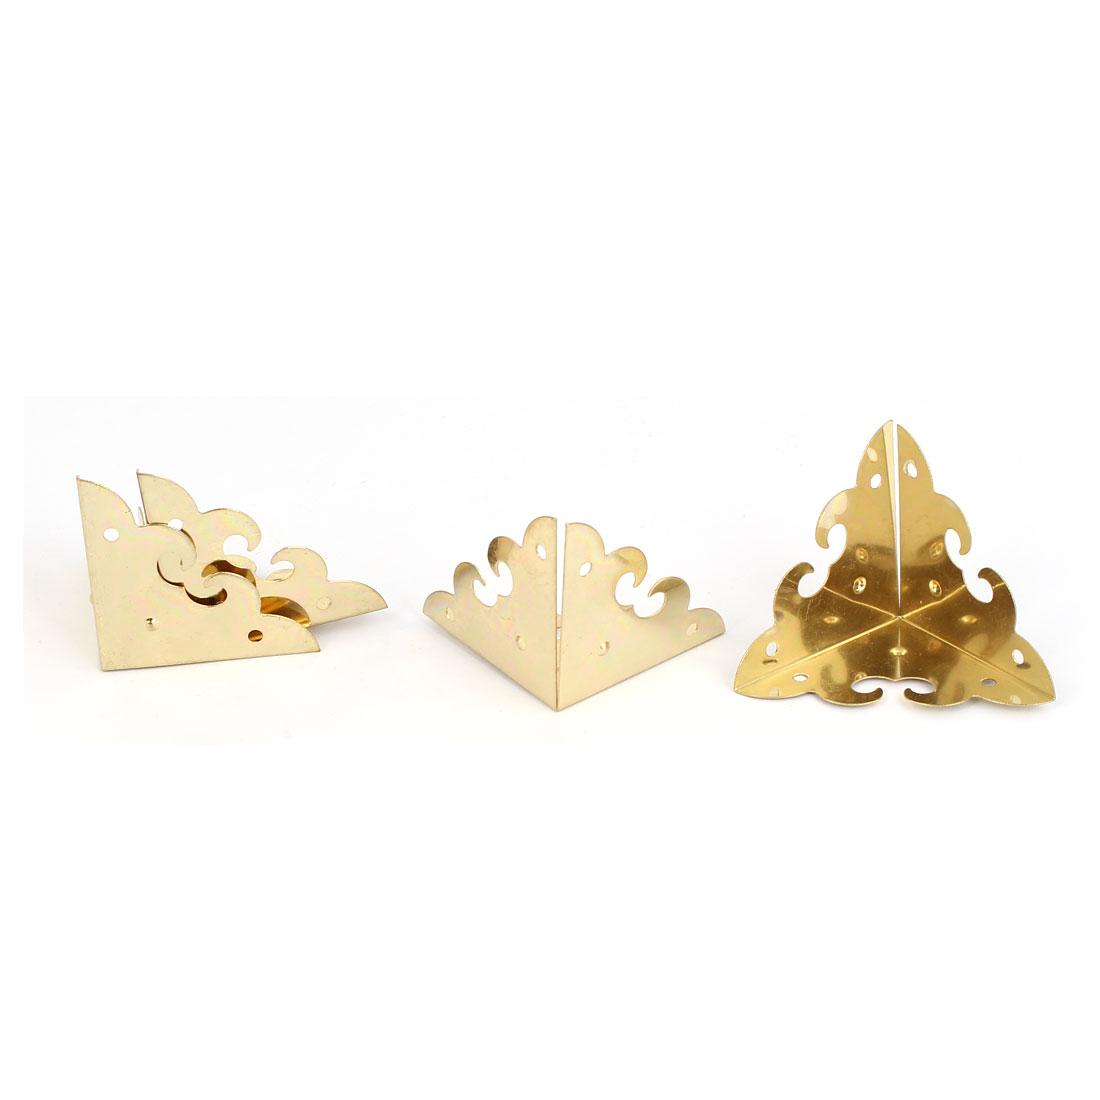 Triangle Corner Protector Gold Tone 4pcs for Box Case